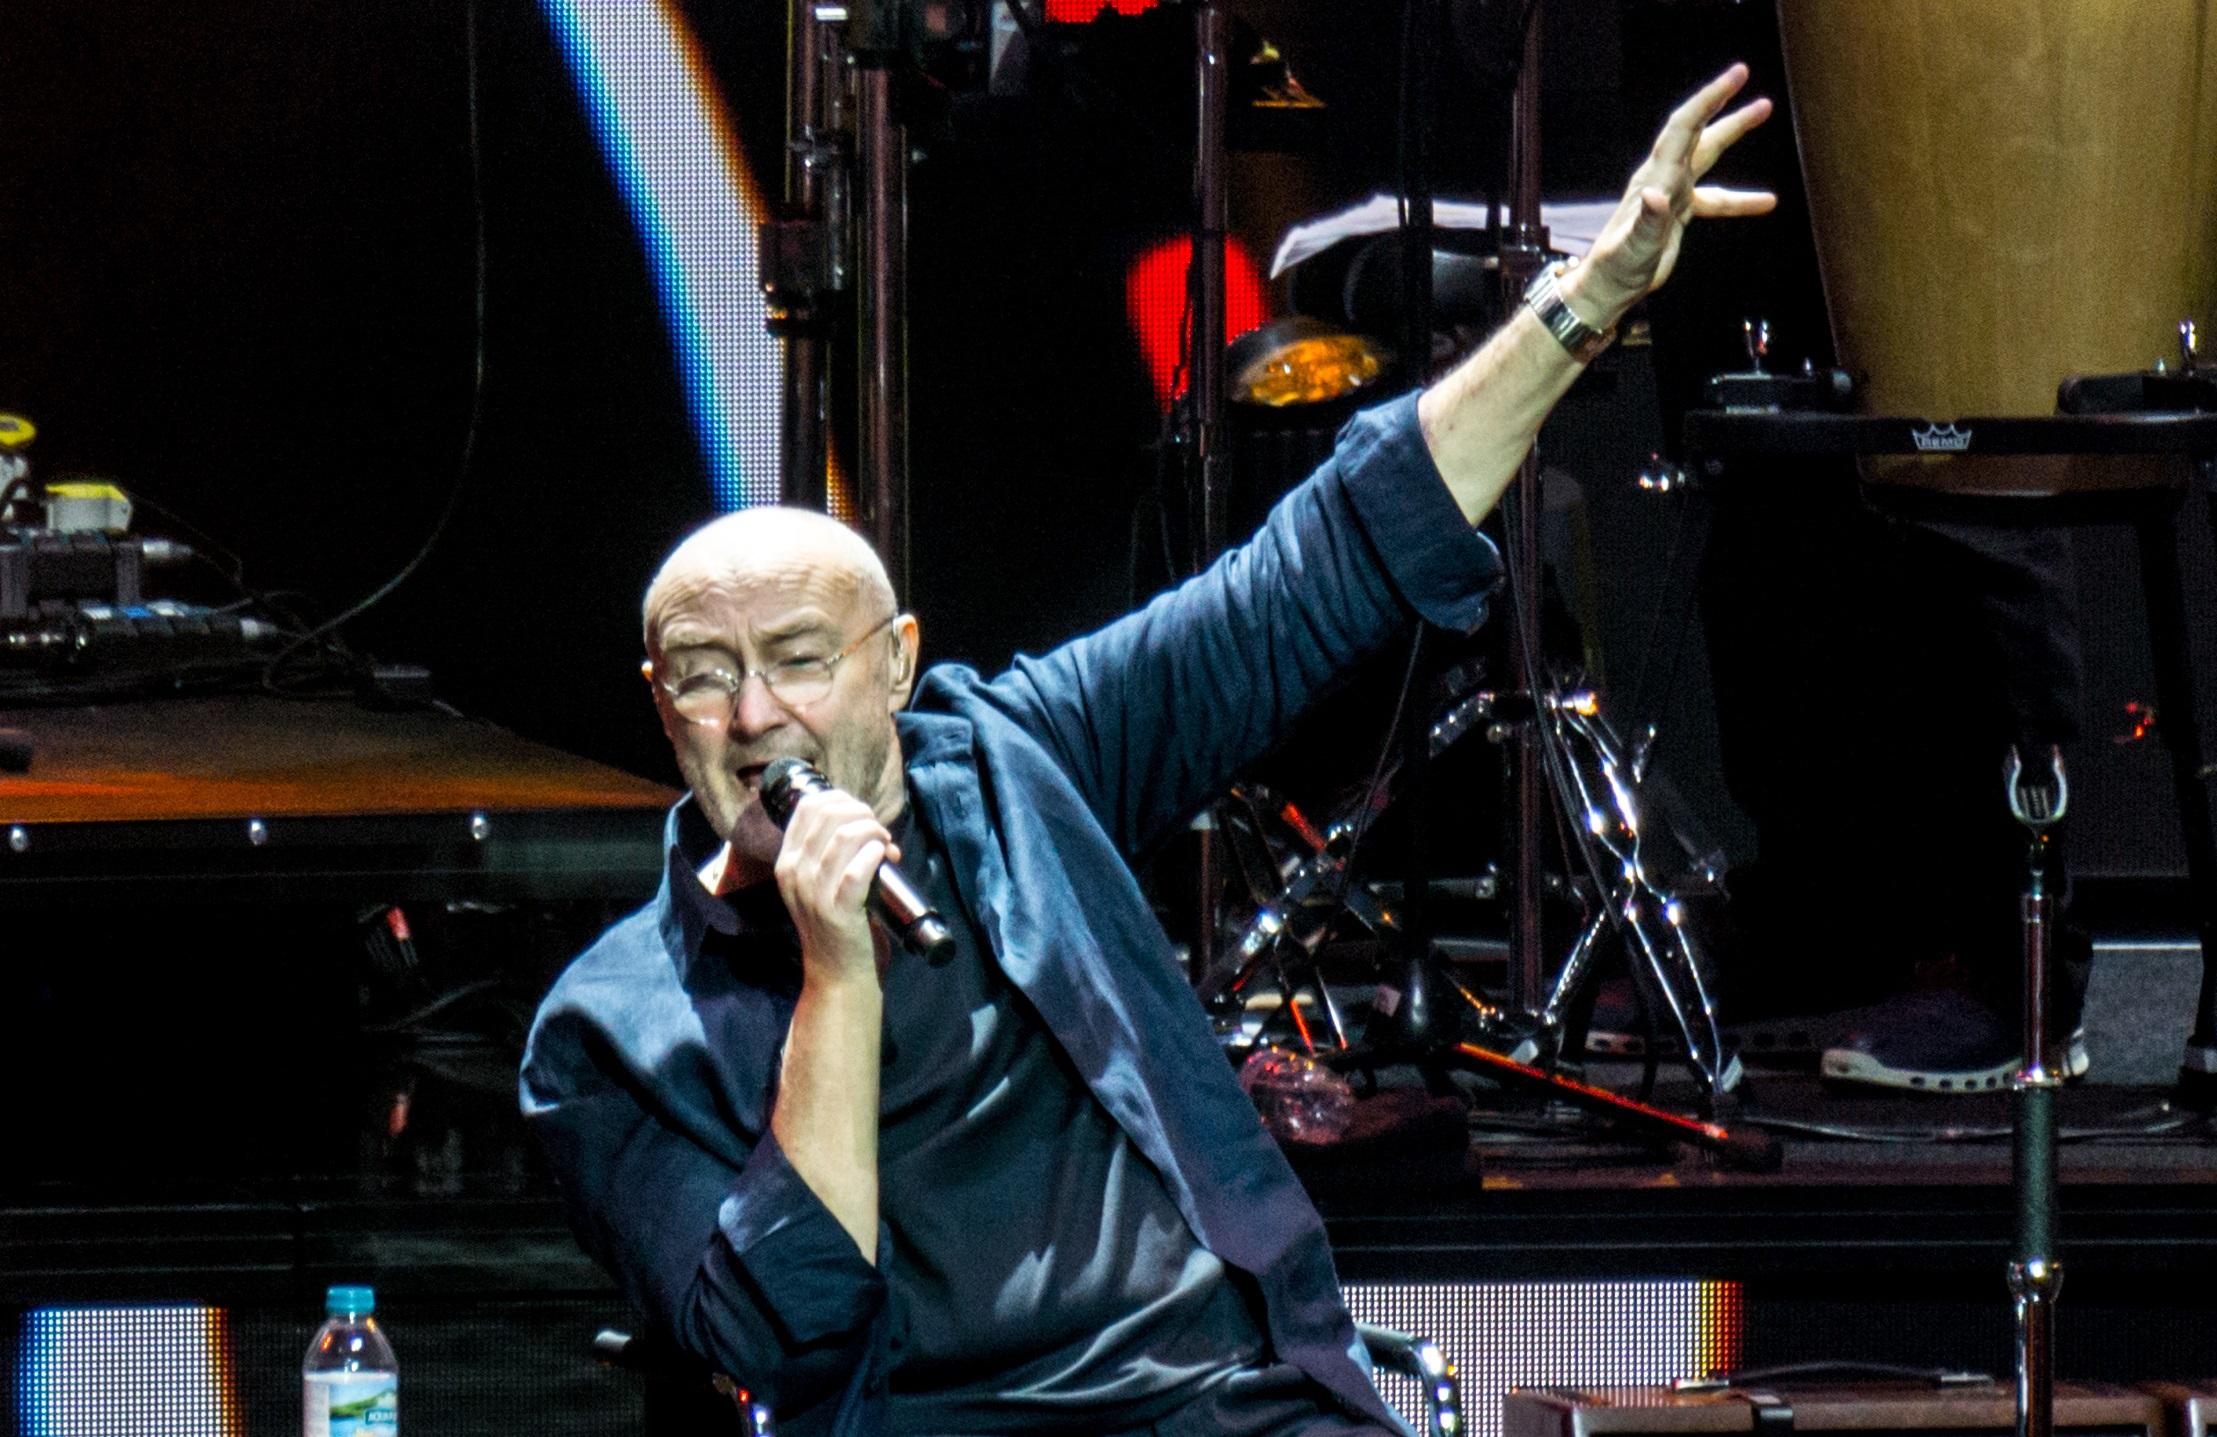 Köln Phil Collins